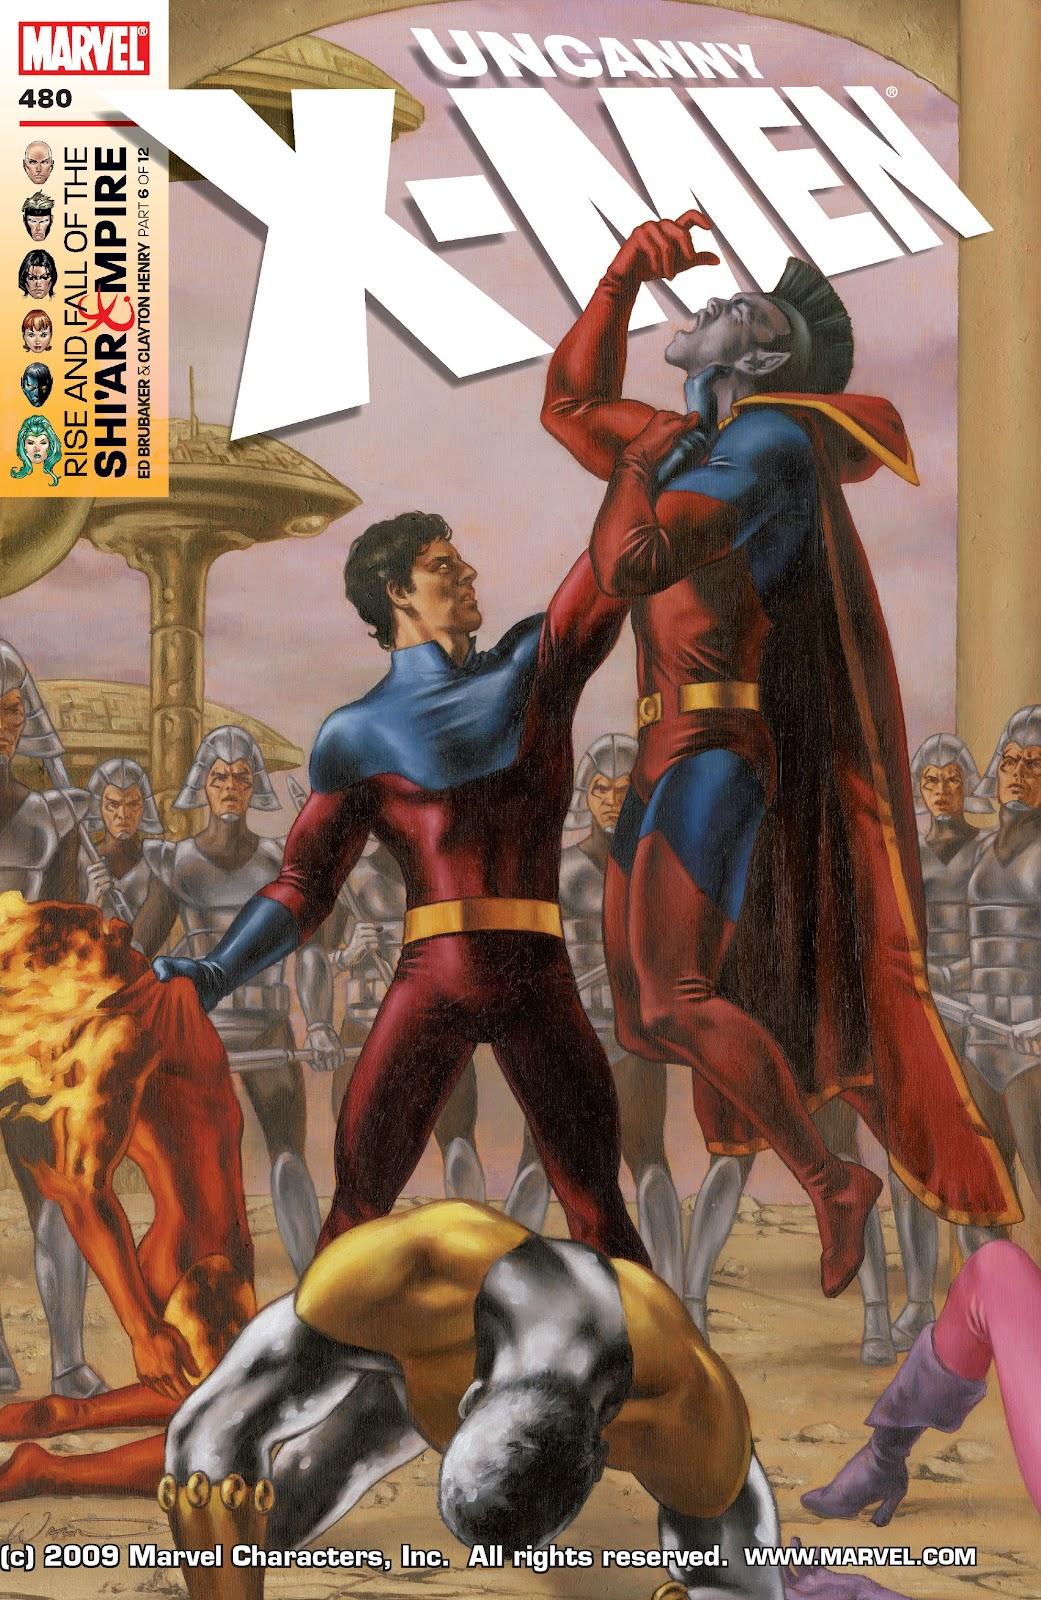 Uncanny X-Men (1963) issue 480 - Page 1